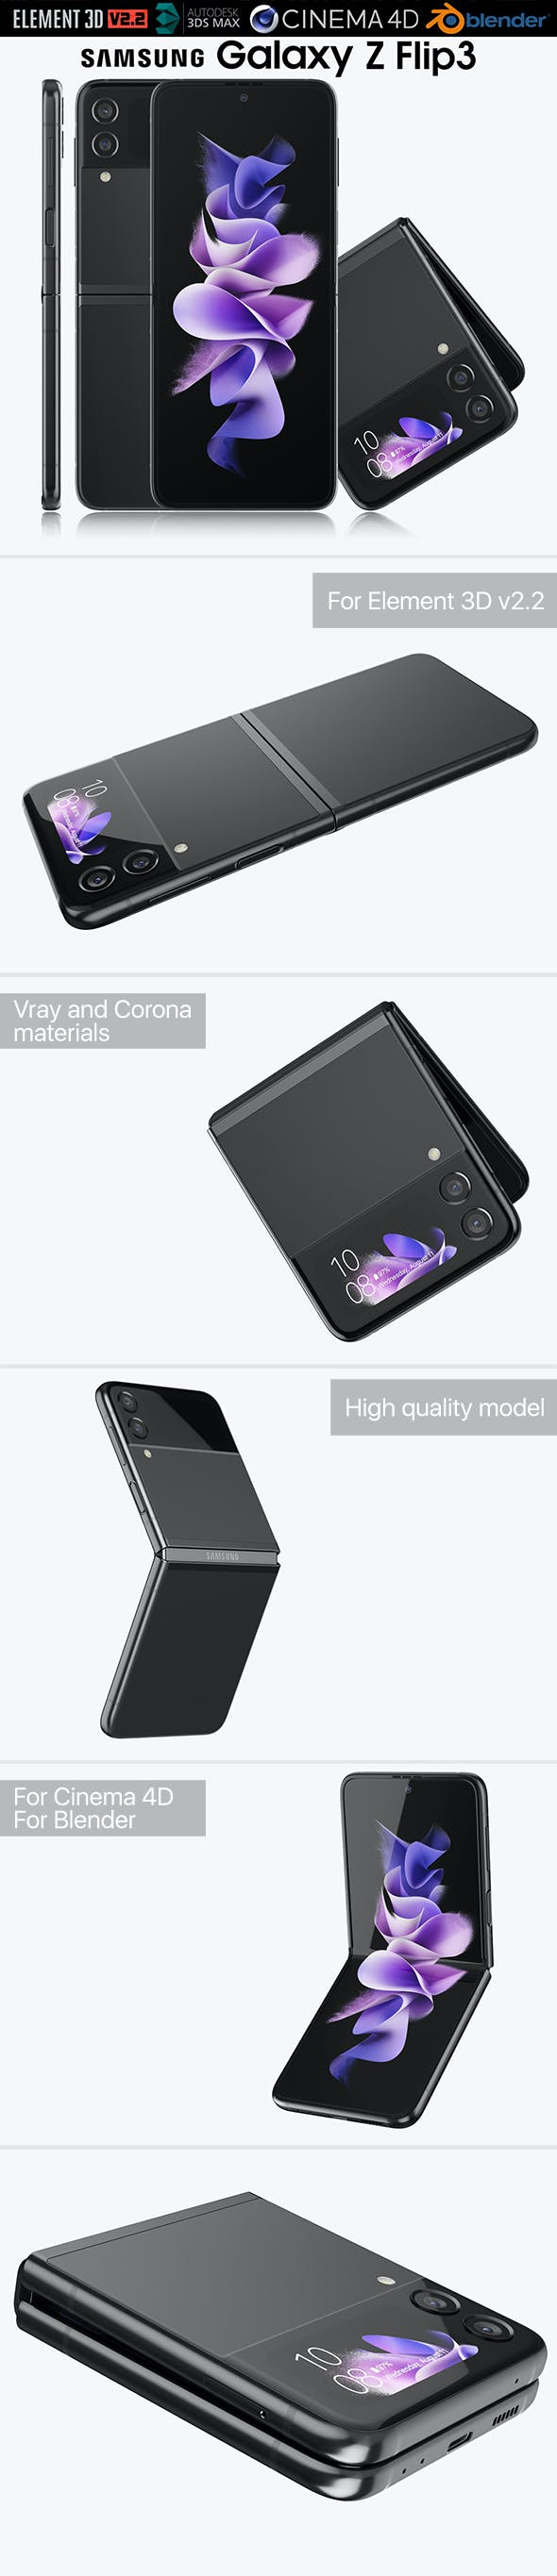 Samsung Galaxy Z Flip 3 - 3DOcean Item for Sale